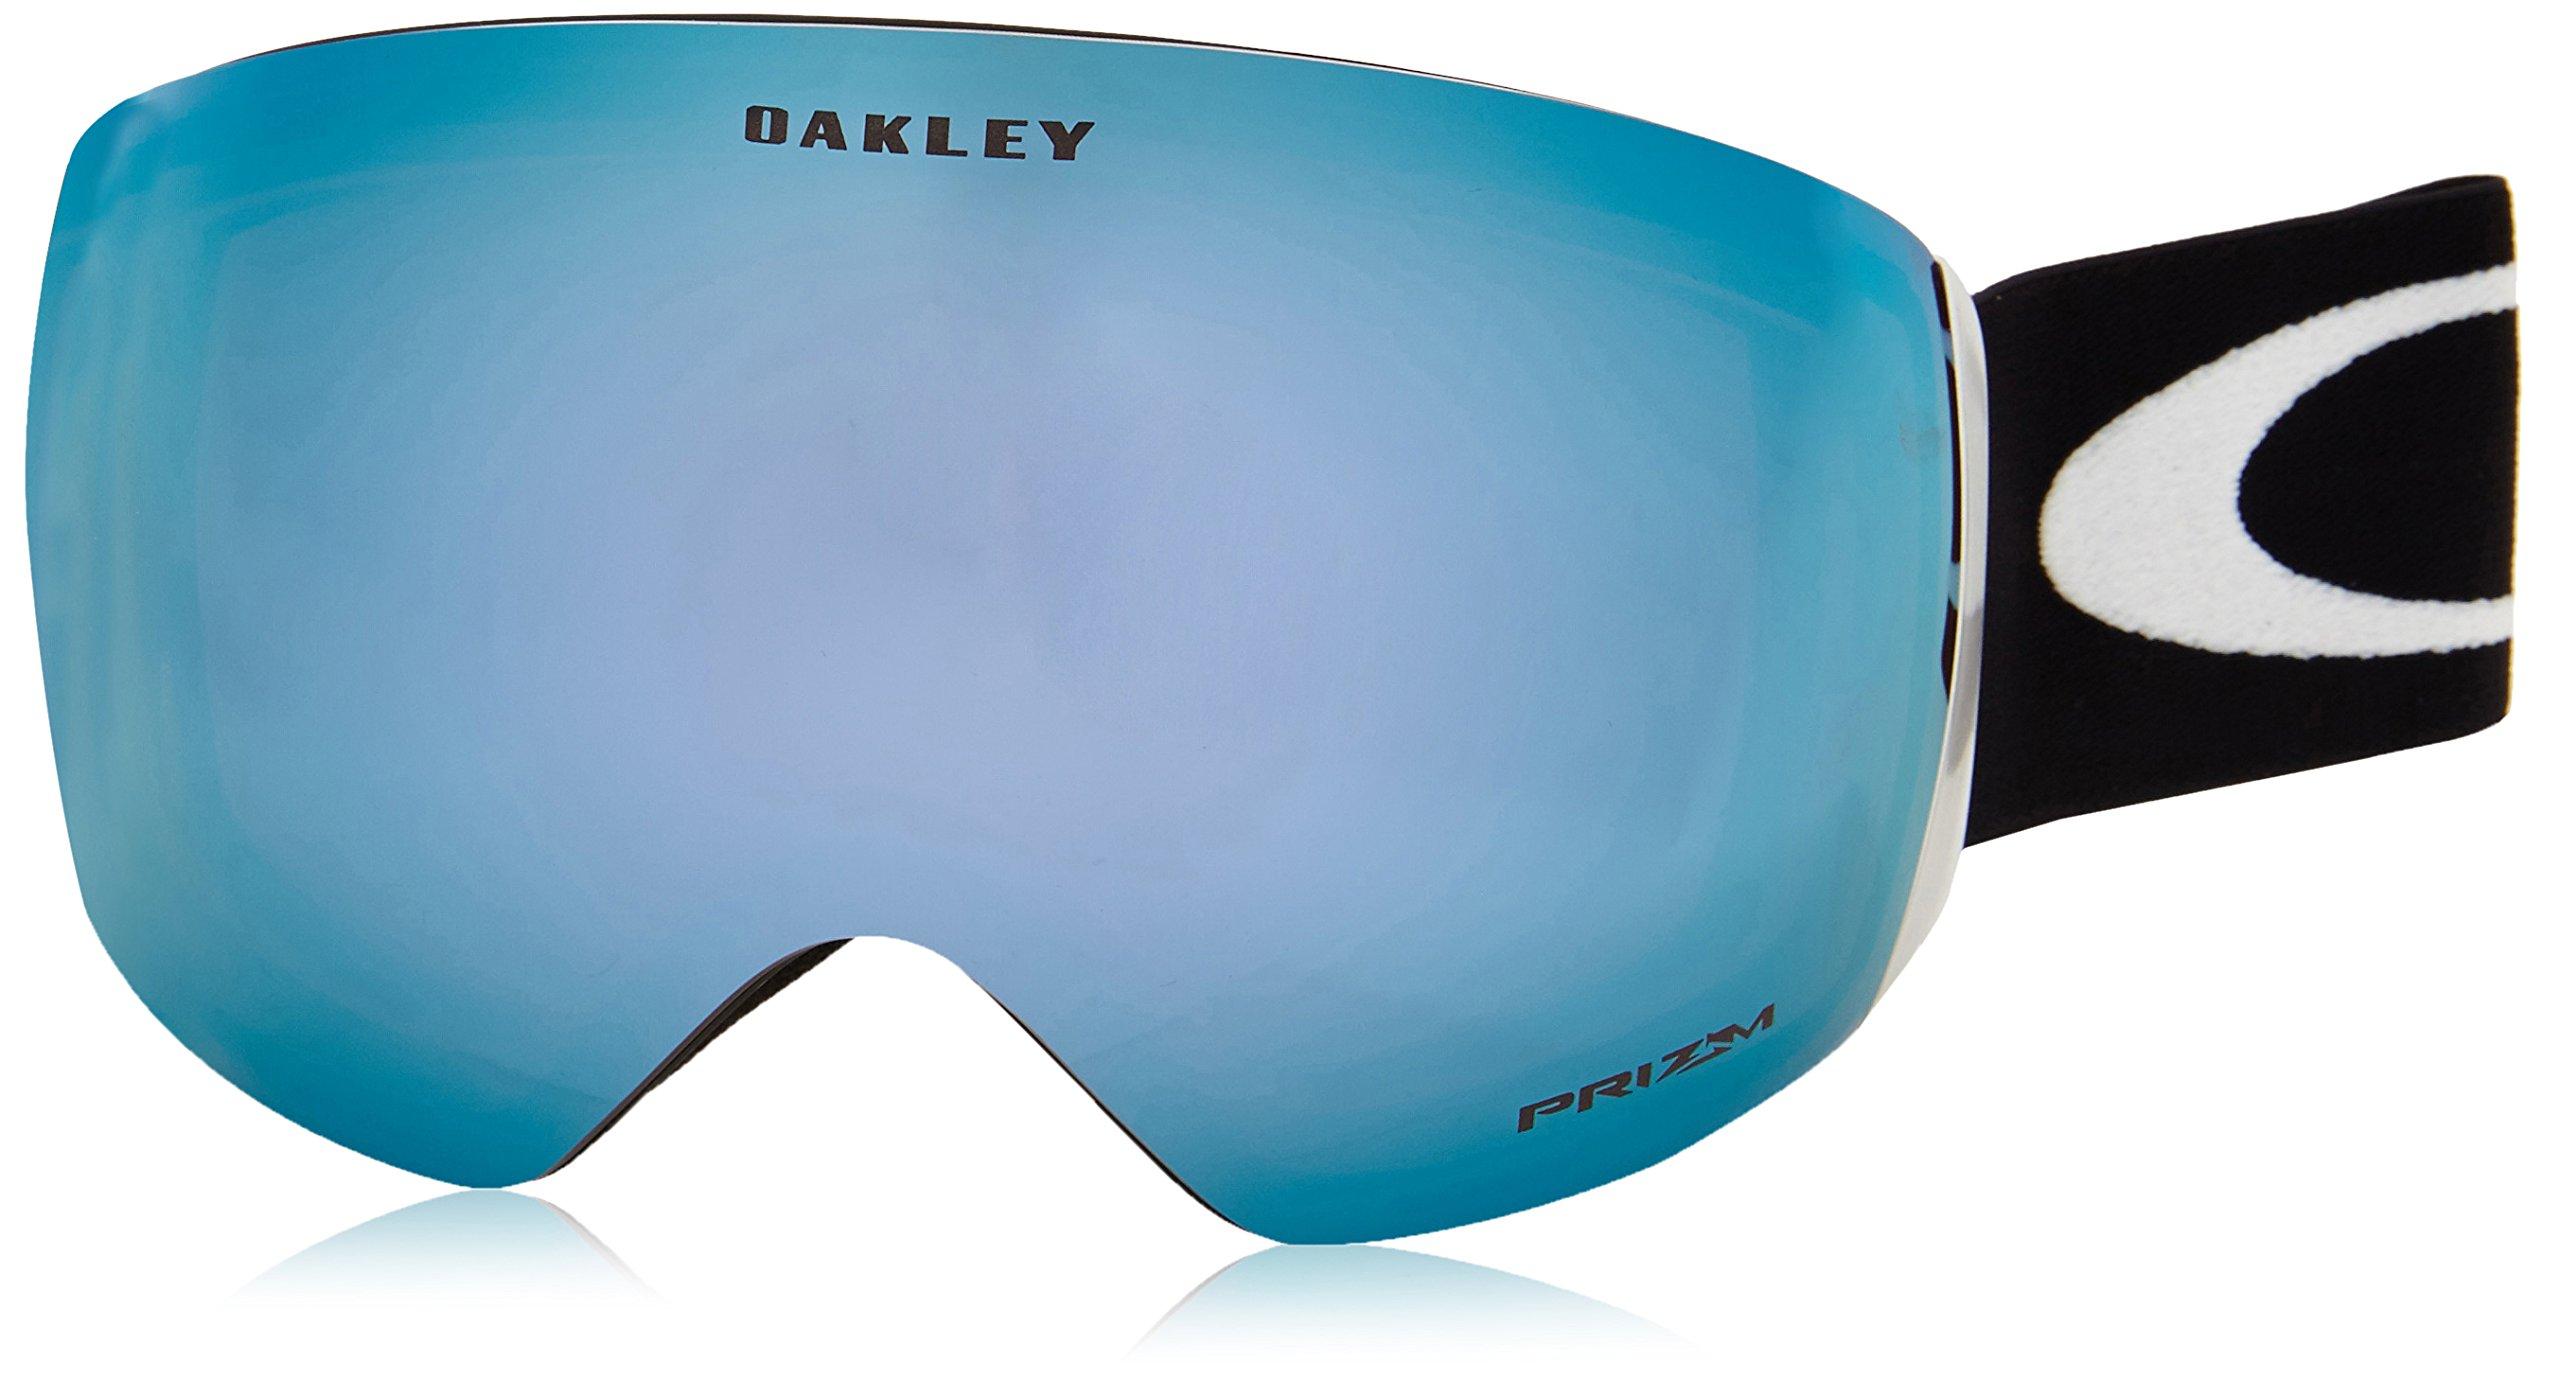 Oakley Flight Deck 705020 0 Gafas Deportivas, Hombre, Negro (Matte Black),